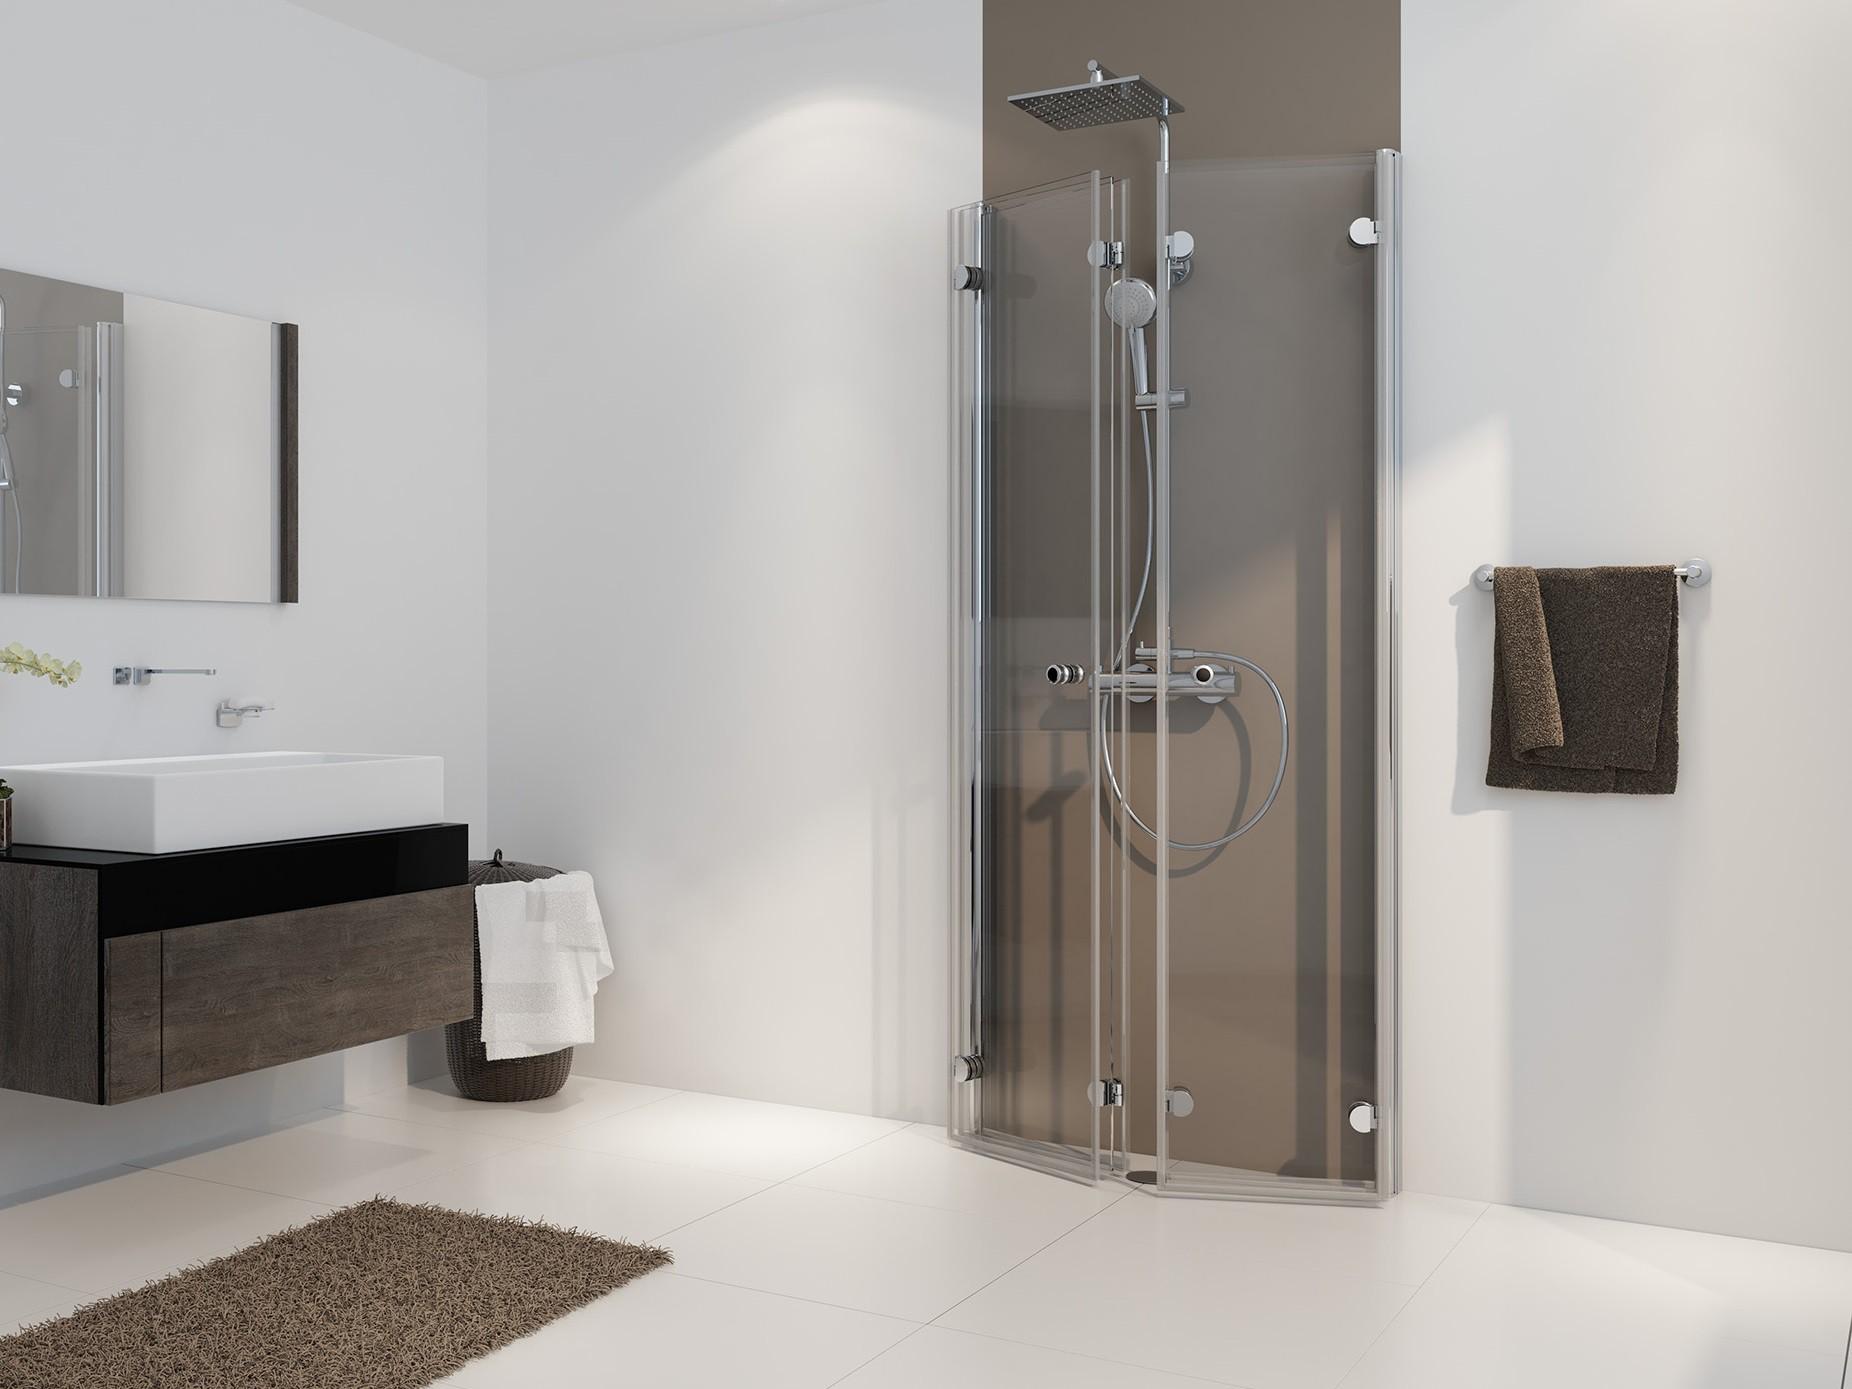 duschkabine u form faltt r 100 x 90 x 220 cm duschabtrennung dusche u form. Black Bedroom Furniture Sets. Home Design Ideas